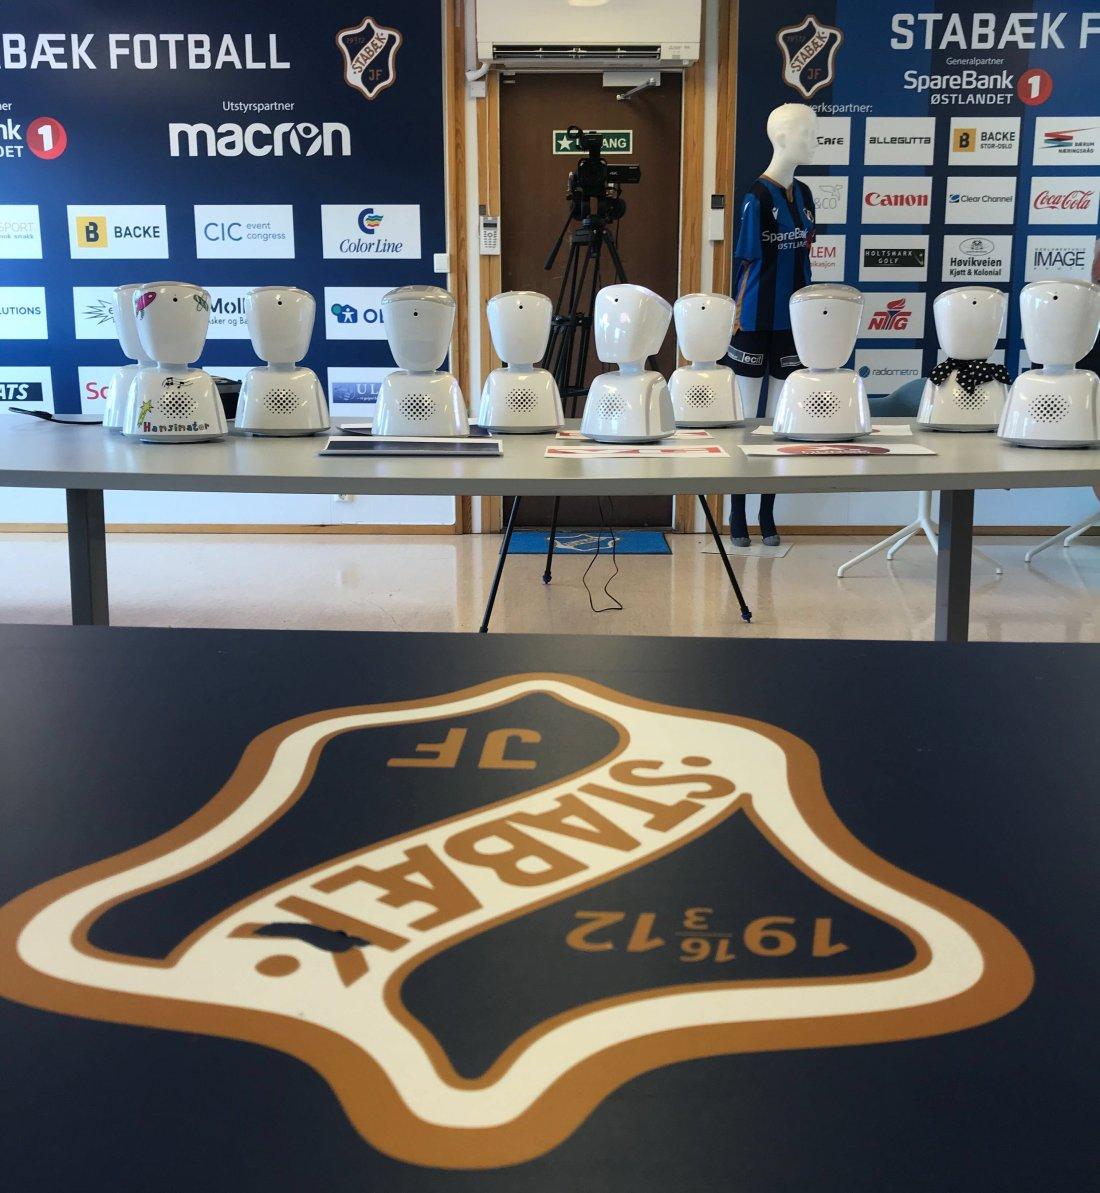 Her er pressekorpset under dagens pressekonferanse hos Stabæk Fotball